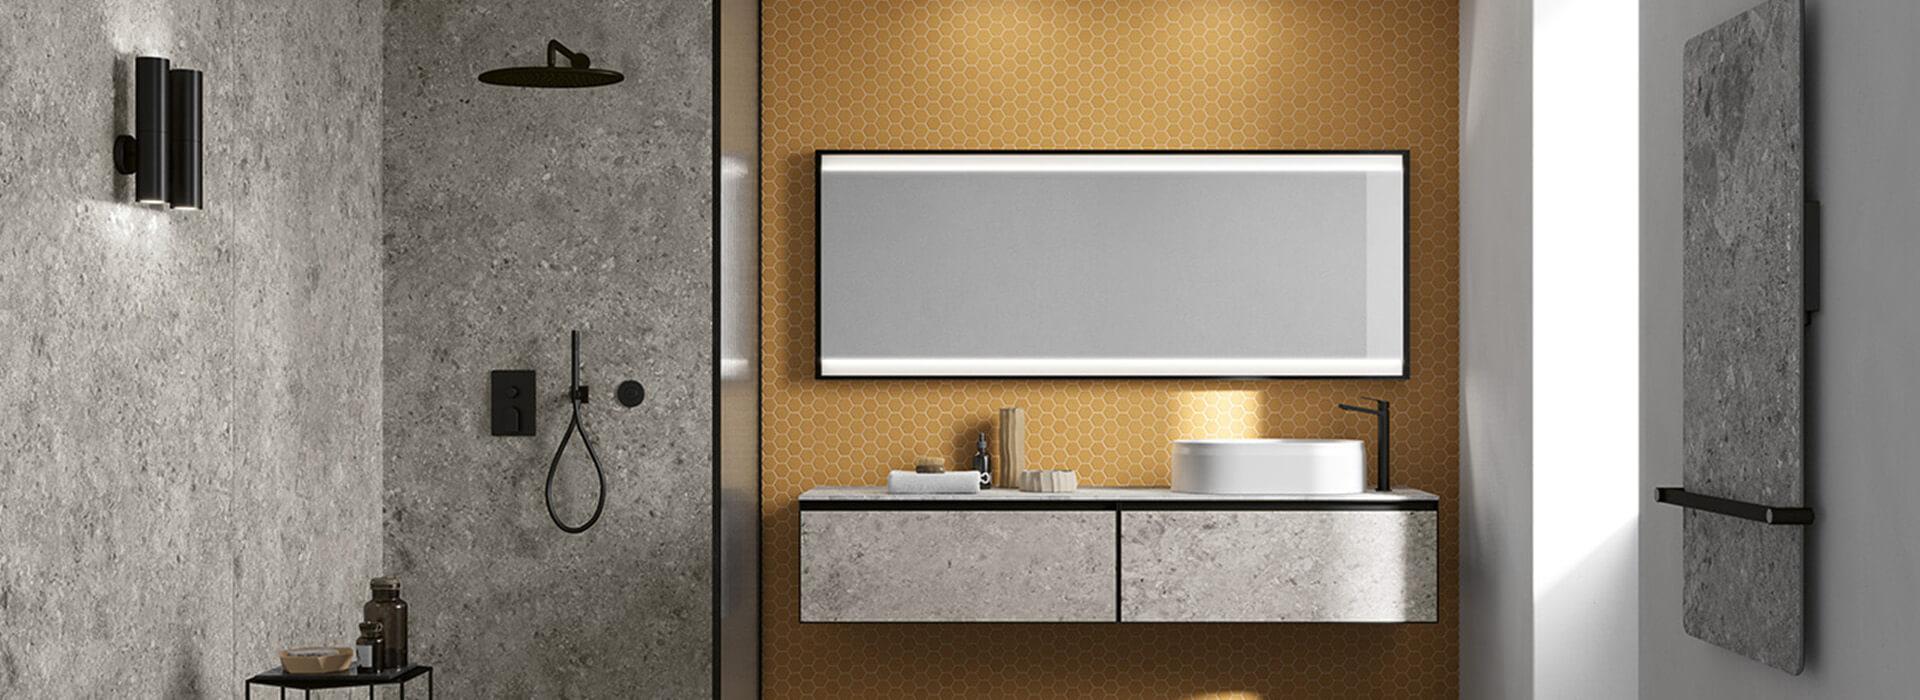 carrelage effet pierre moderne dans une salle de bain